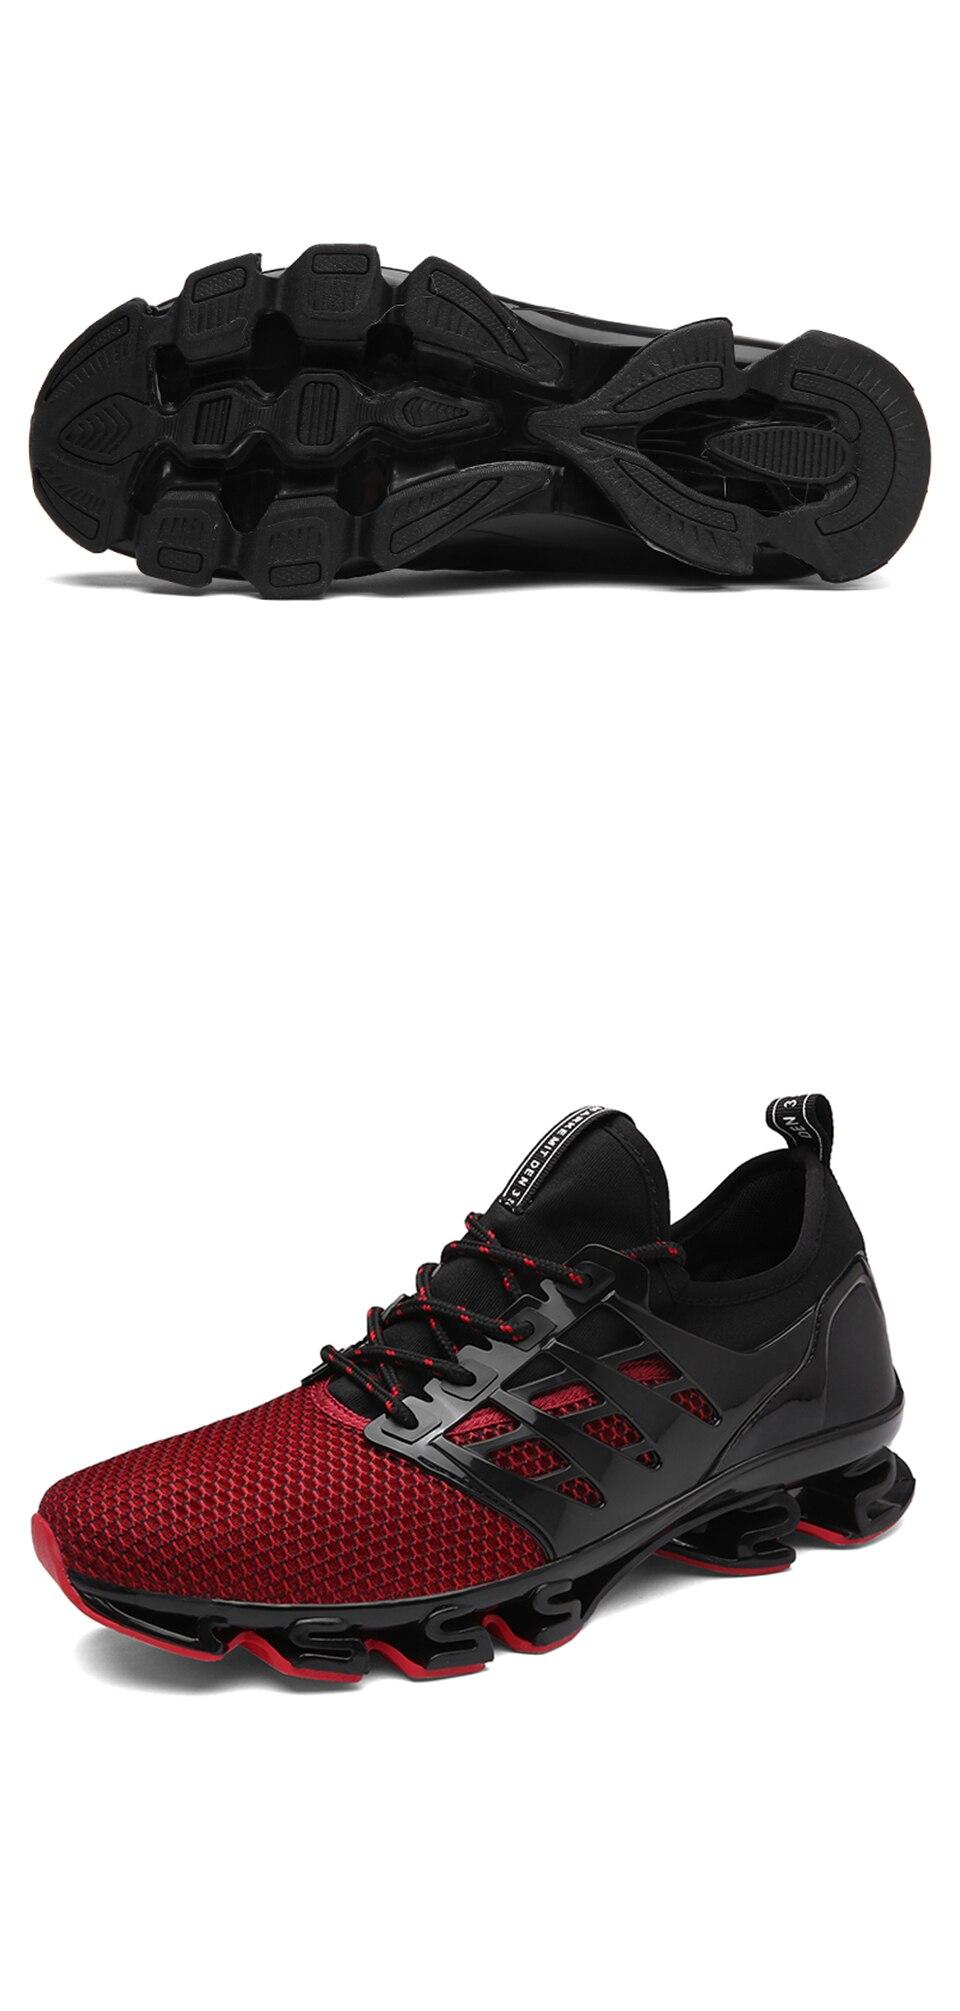 reputable site 04e21 323e4 Acheter 2018 Nouveau Sport Hommes Sneakers Running Chaussures De ...